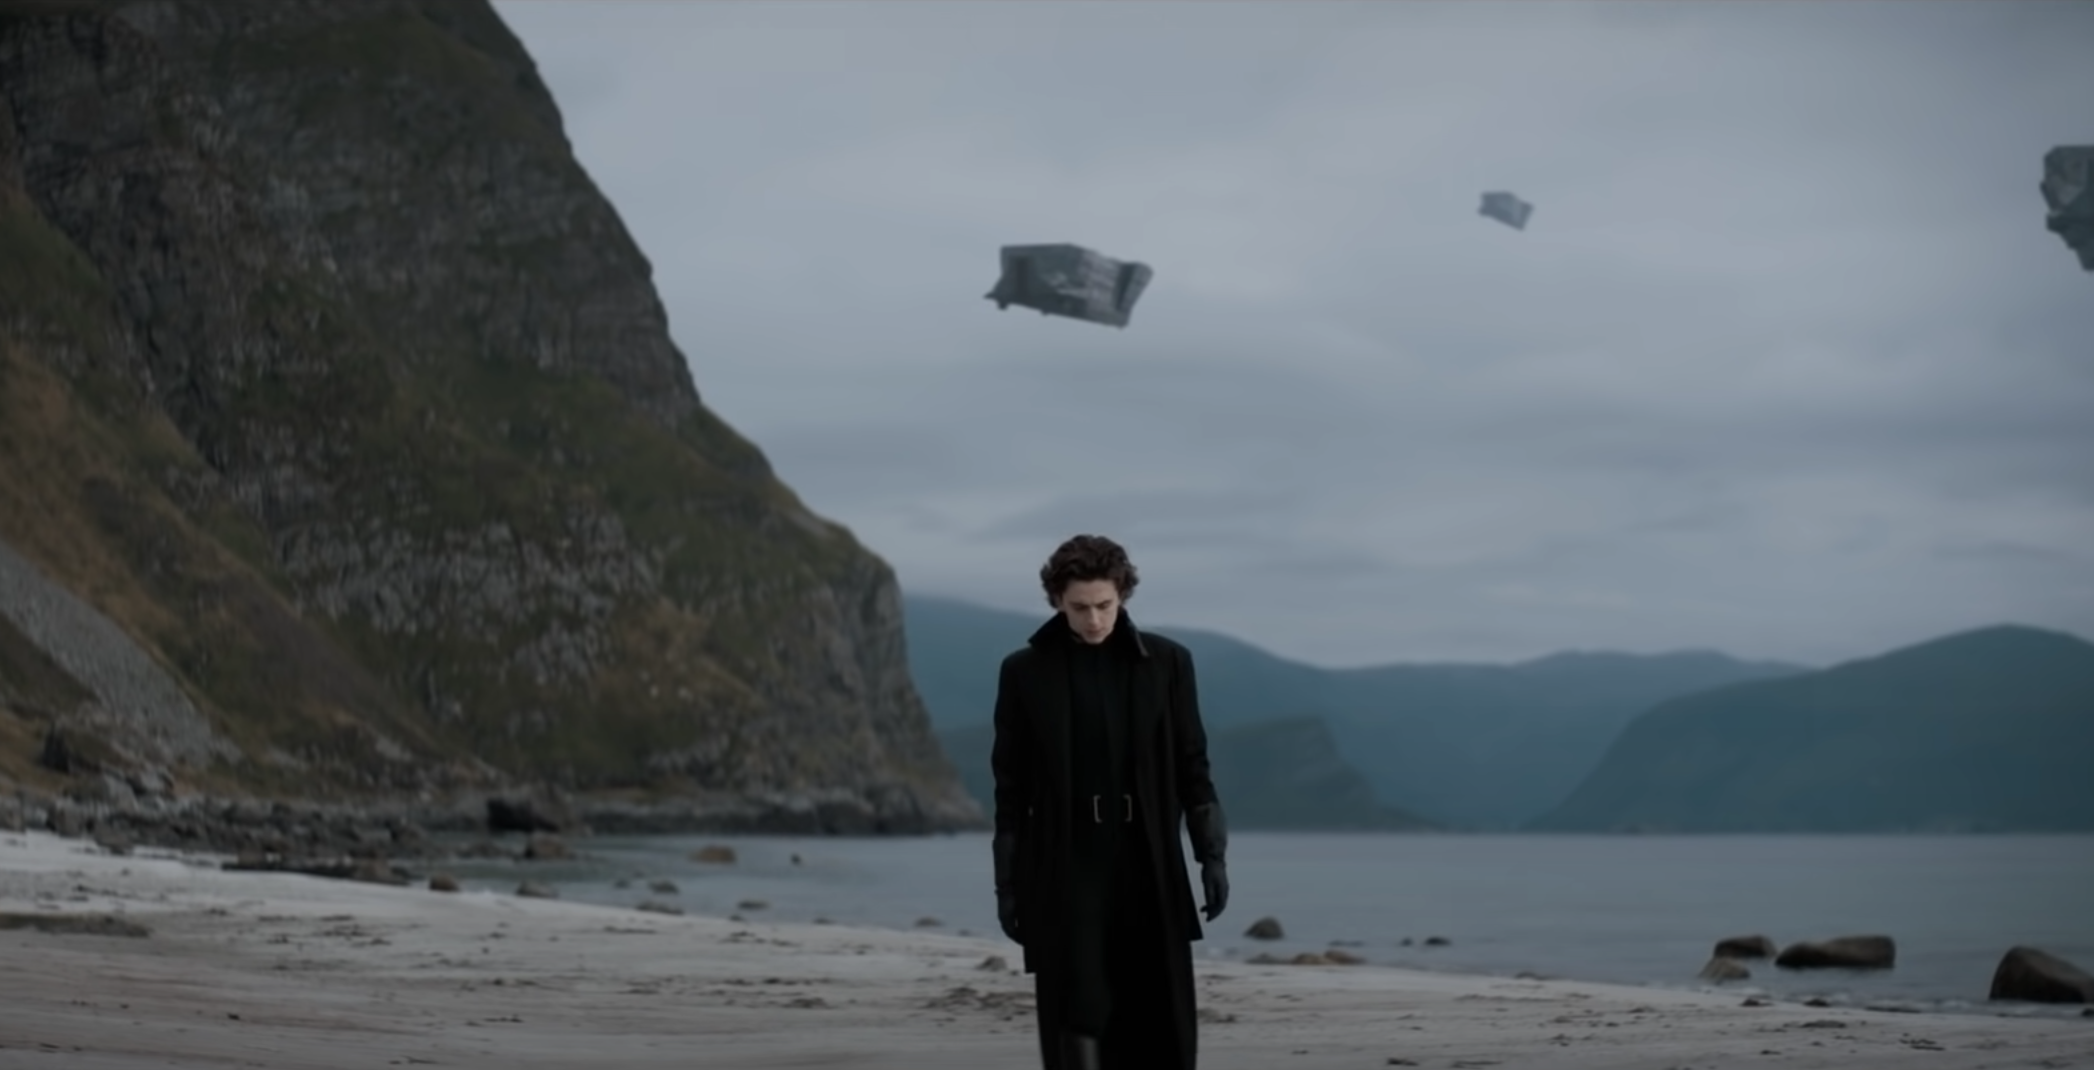 How to Watch 'Dune'